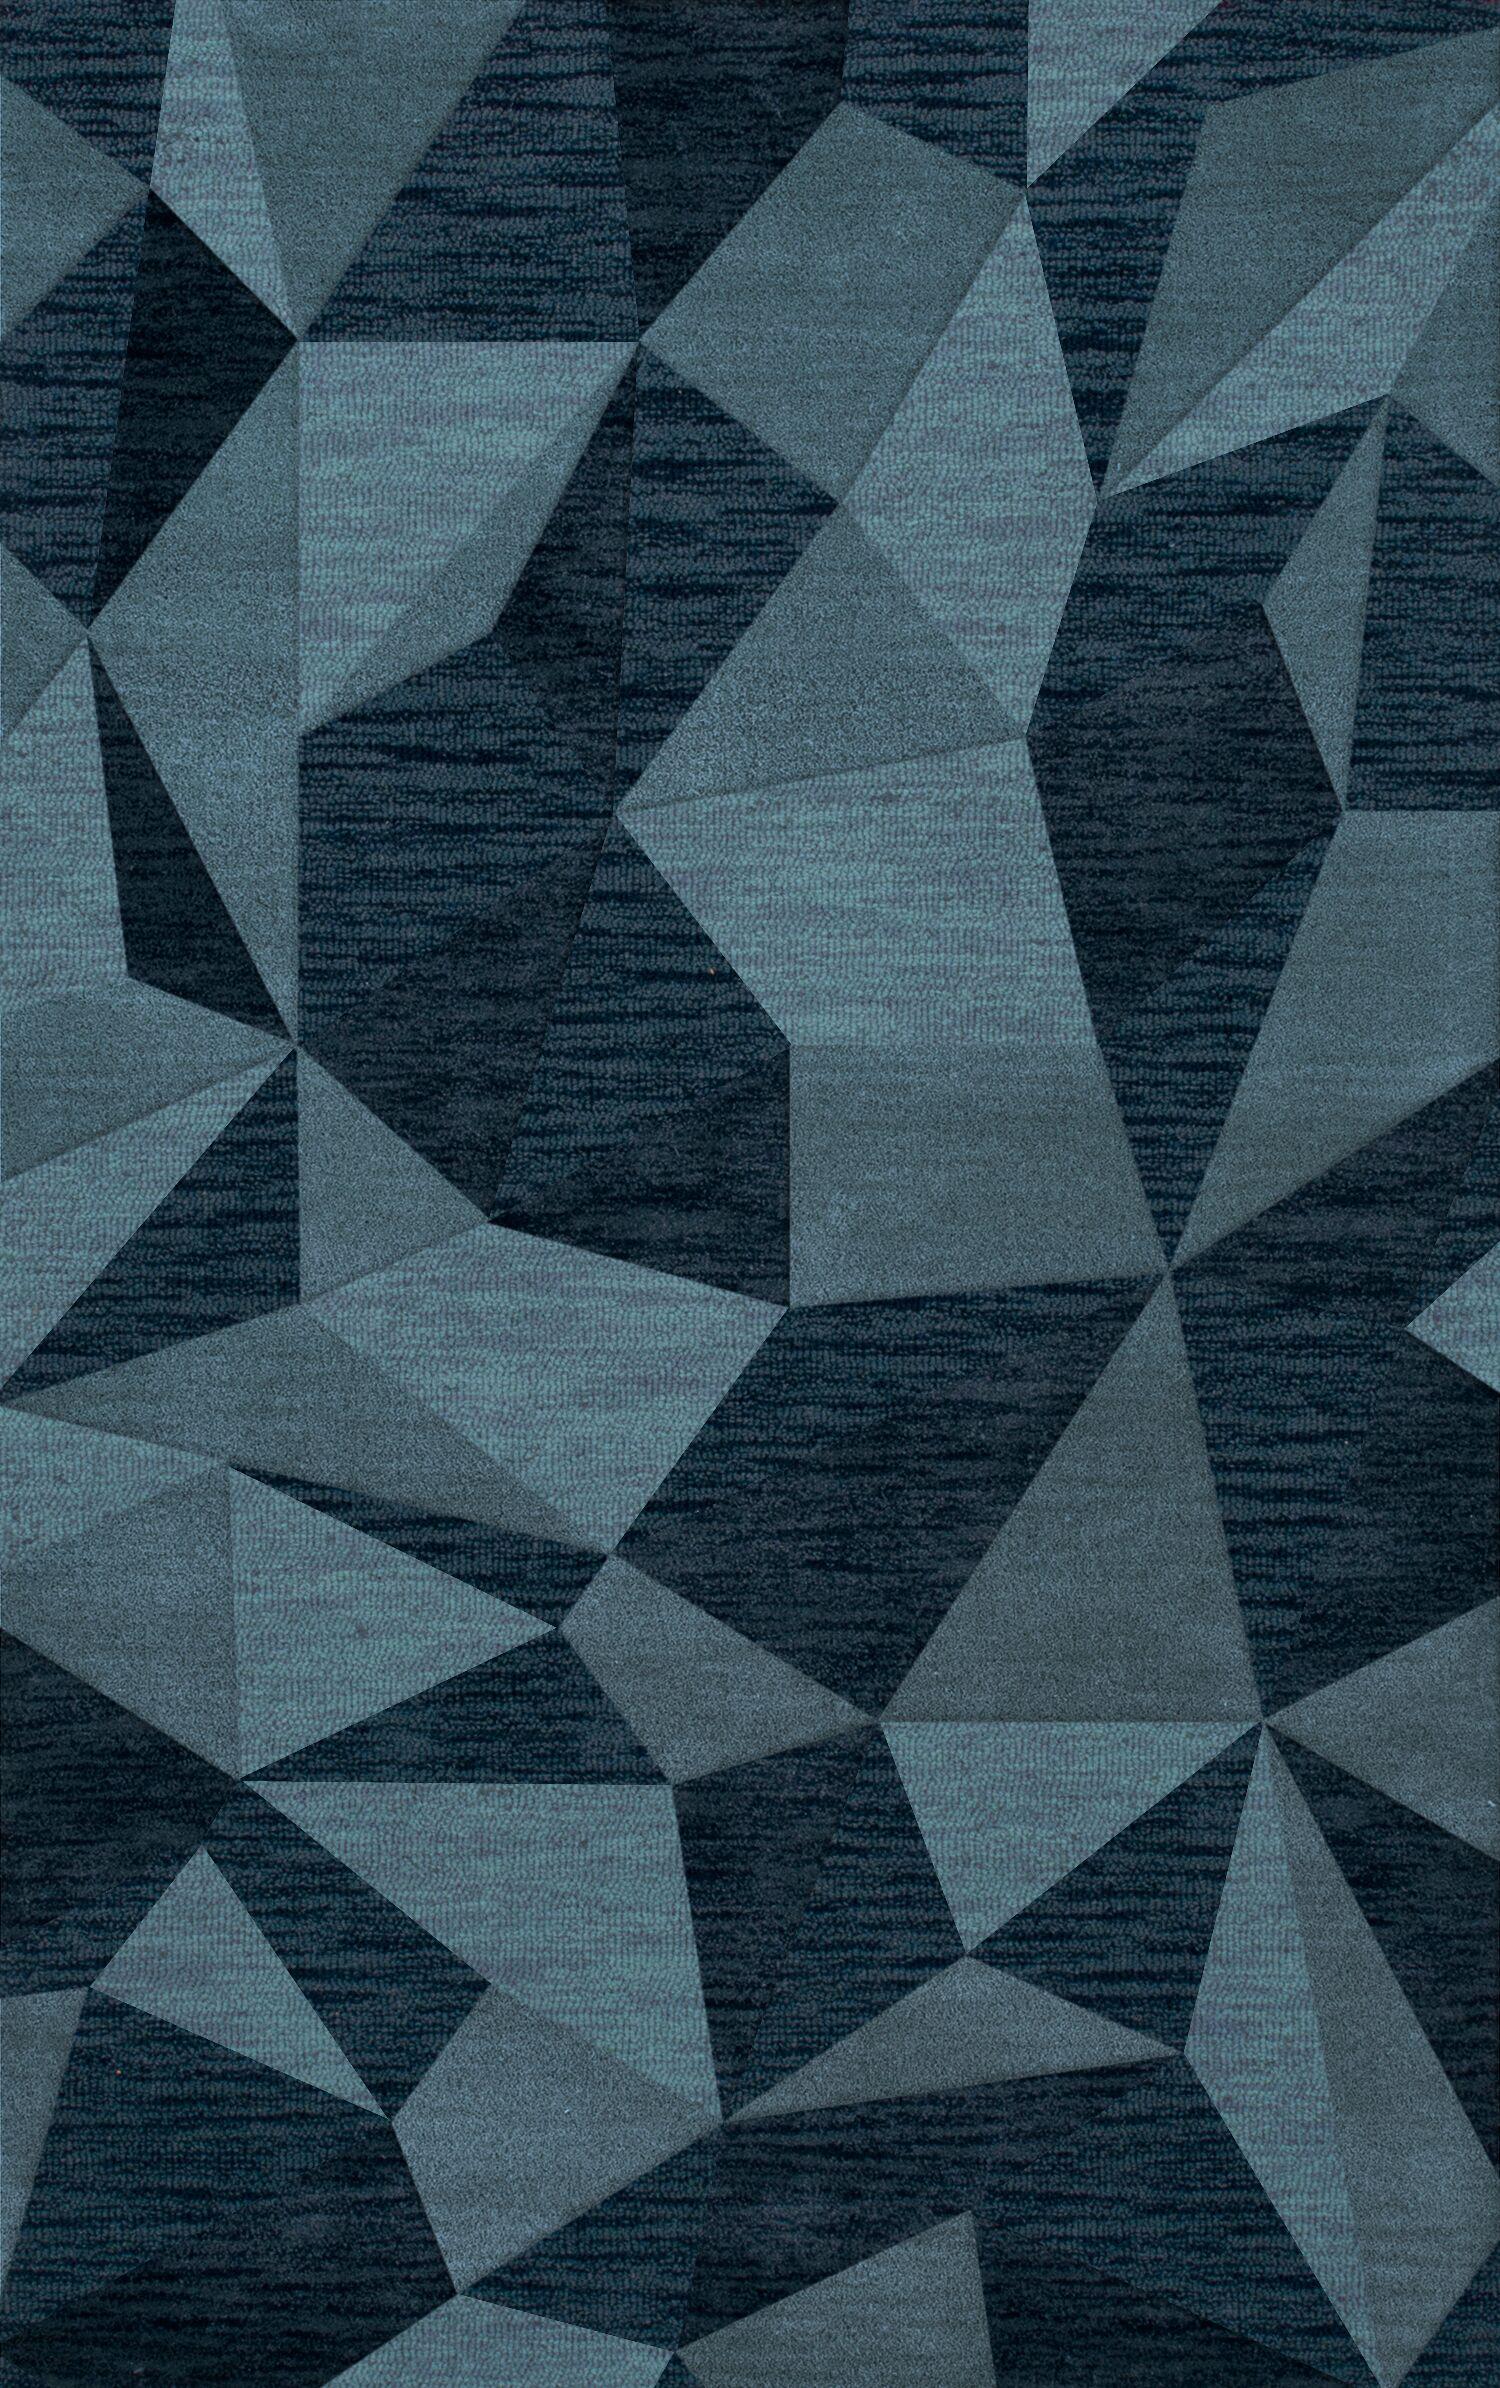 Bella Machine Woven Wool Blue Area Rug Rug Size: Rectangle 5' x 8'